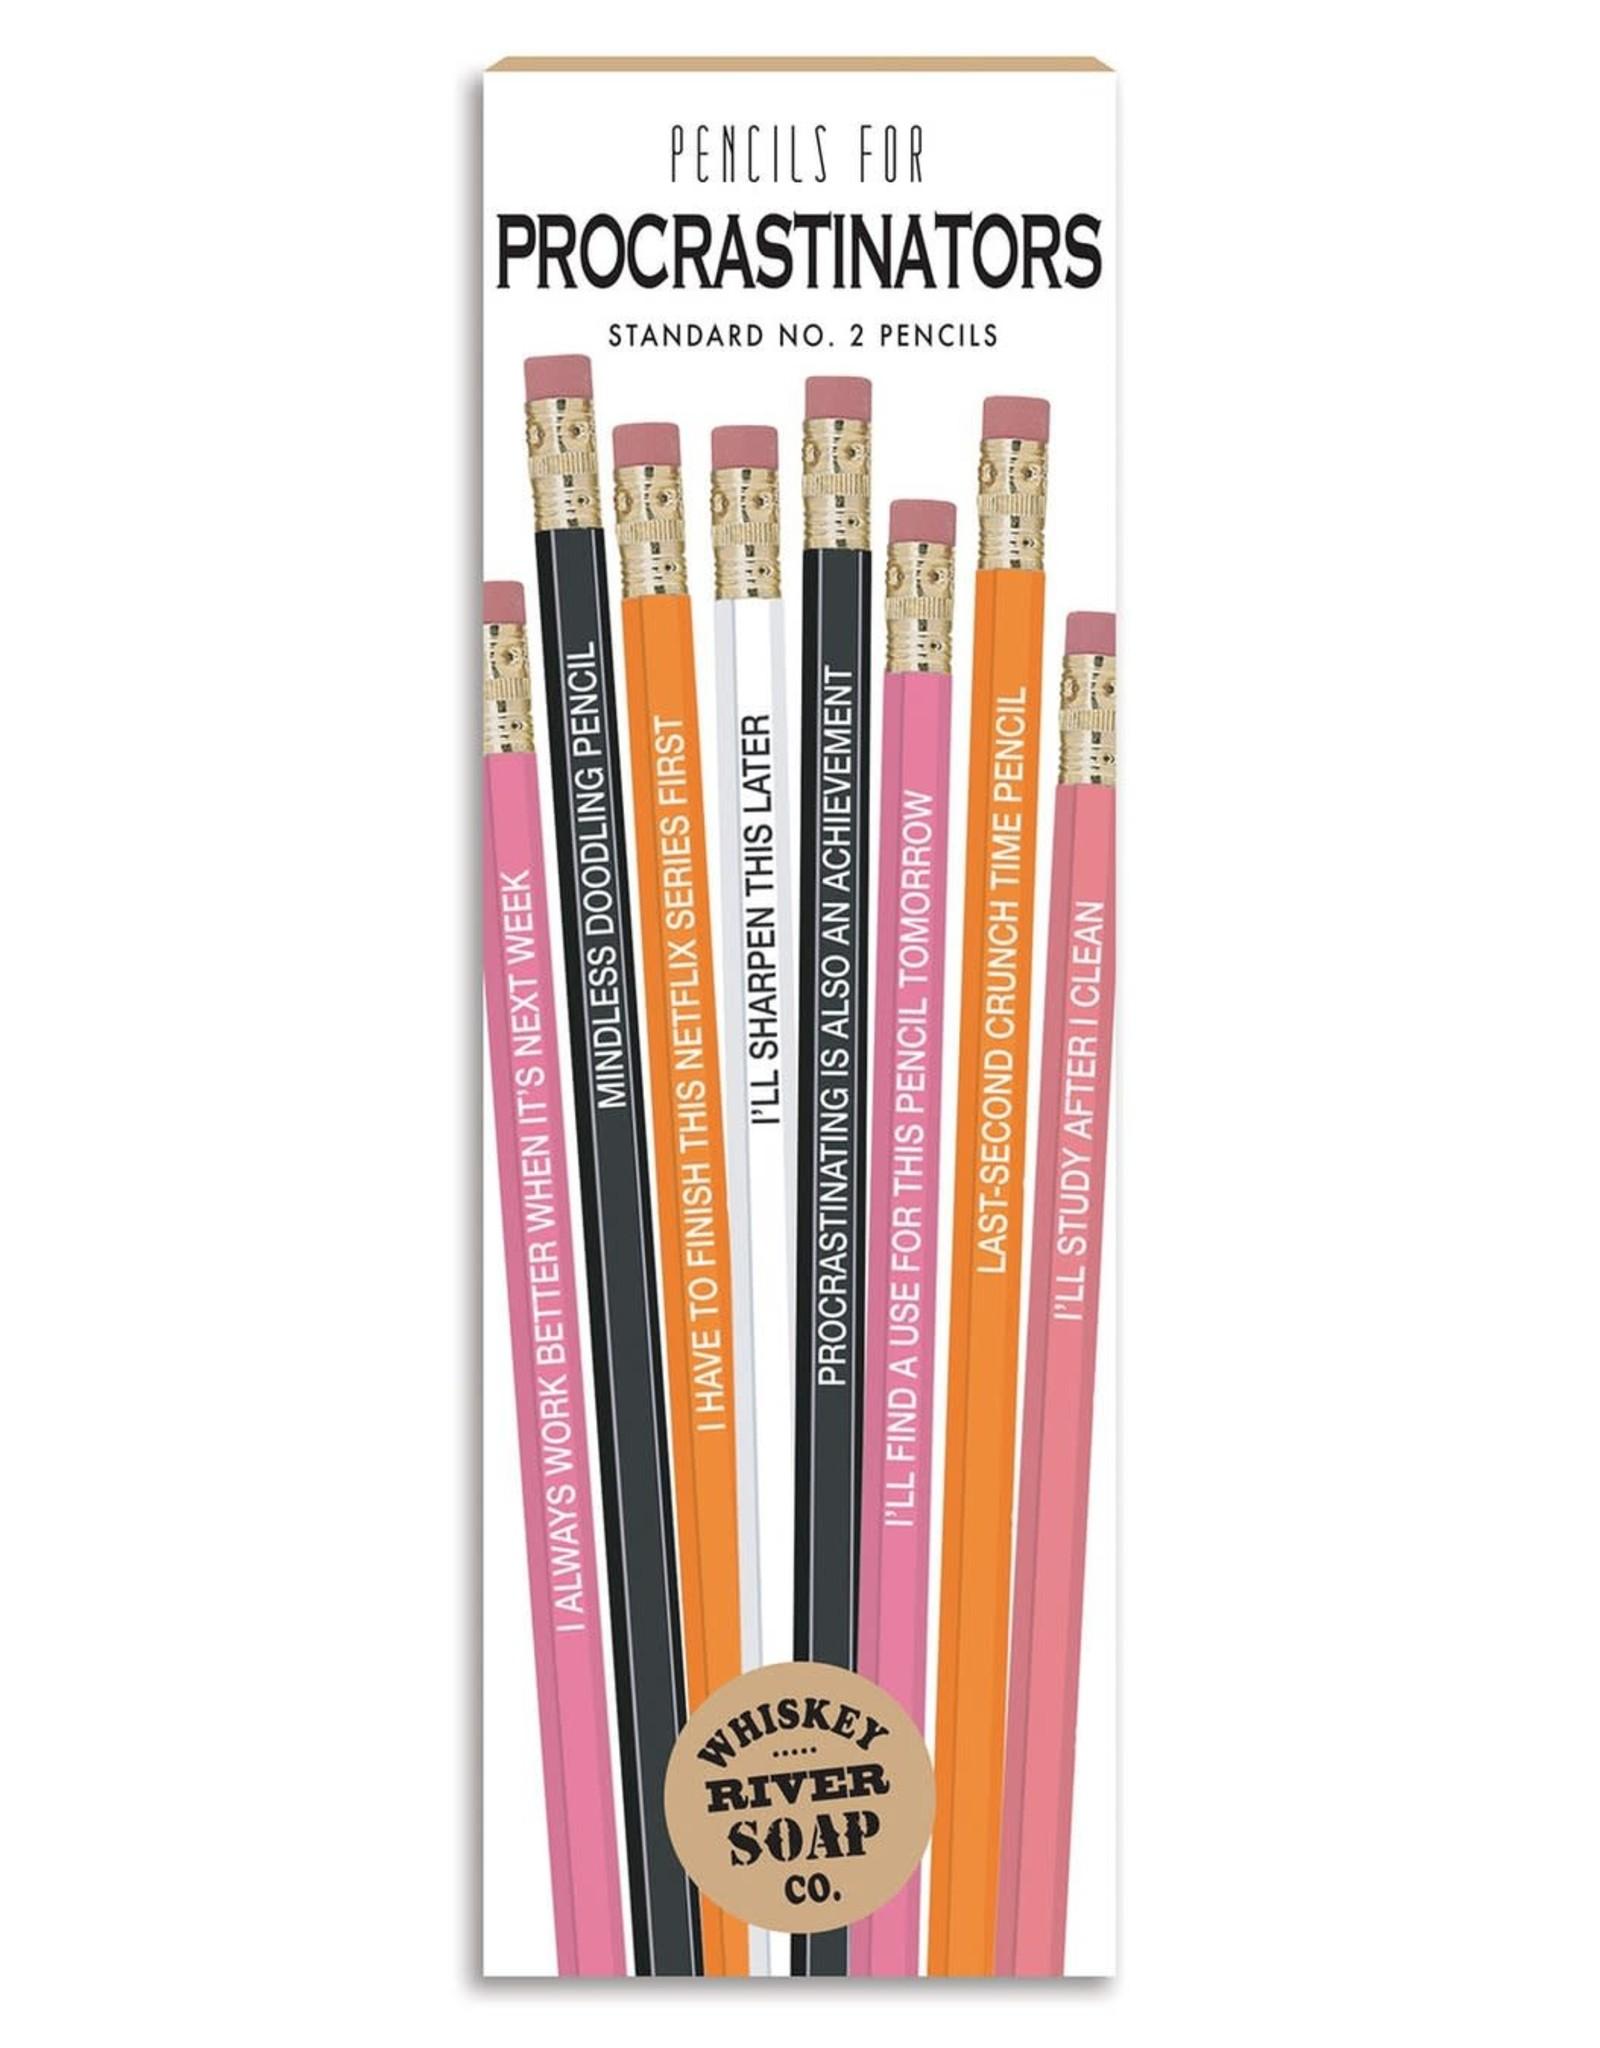 Whiskey River Soap WER - Pencils/ Procrastinators 8 pack